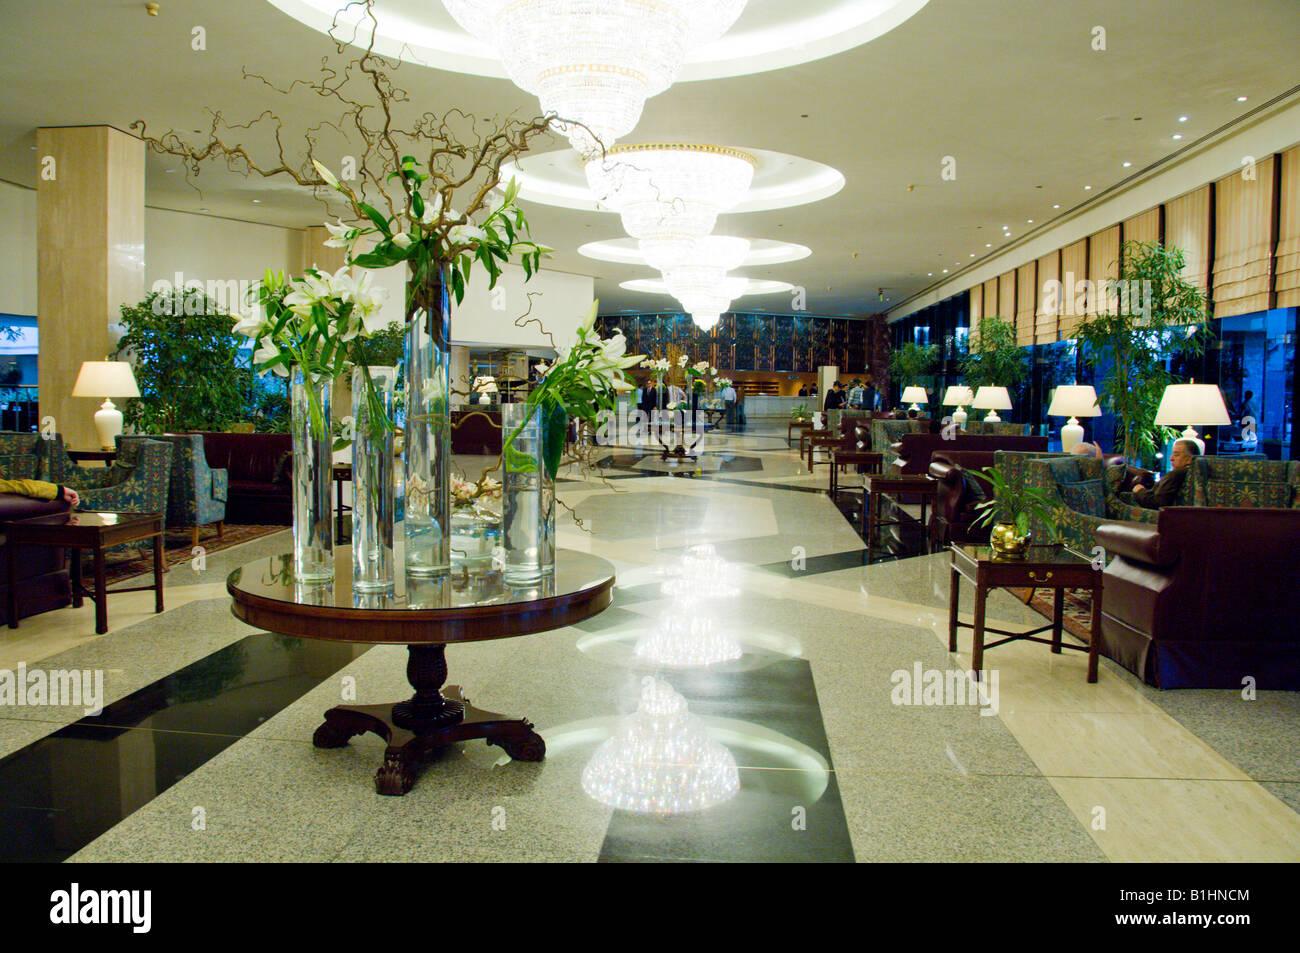 Interior main lobby of the Sheraton Heliopolis Hotel in Cairo Egypt - Stock Image